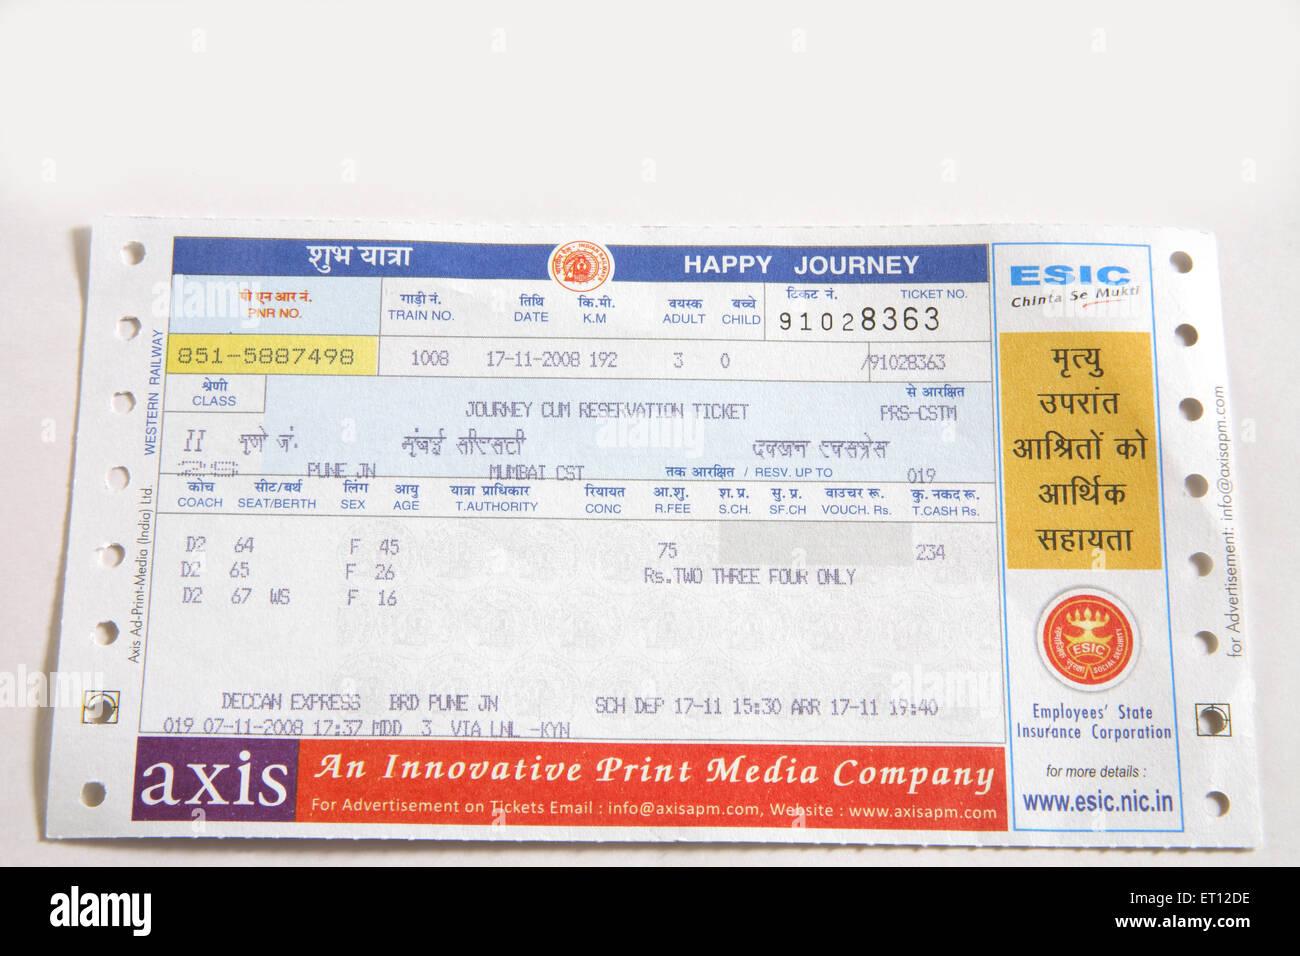 Railway Ticket Stock Photos & Railway Ticket Stock Images